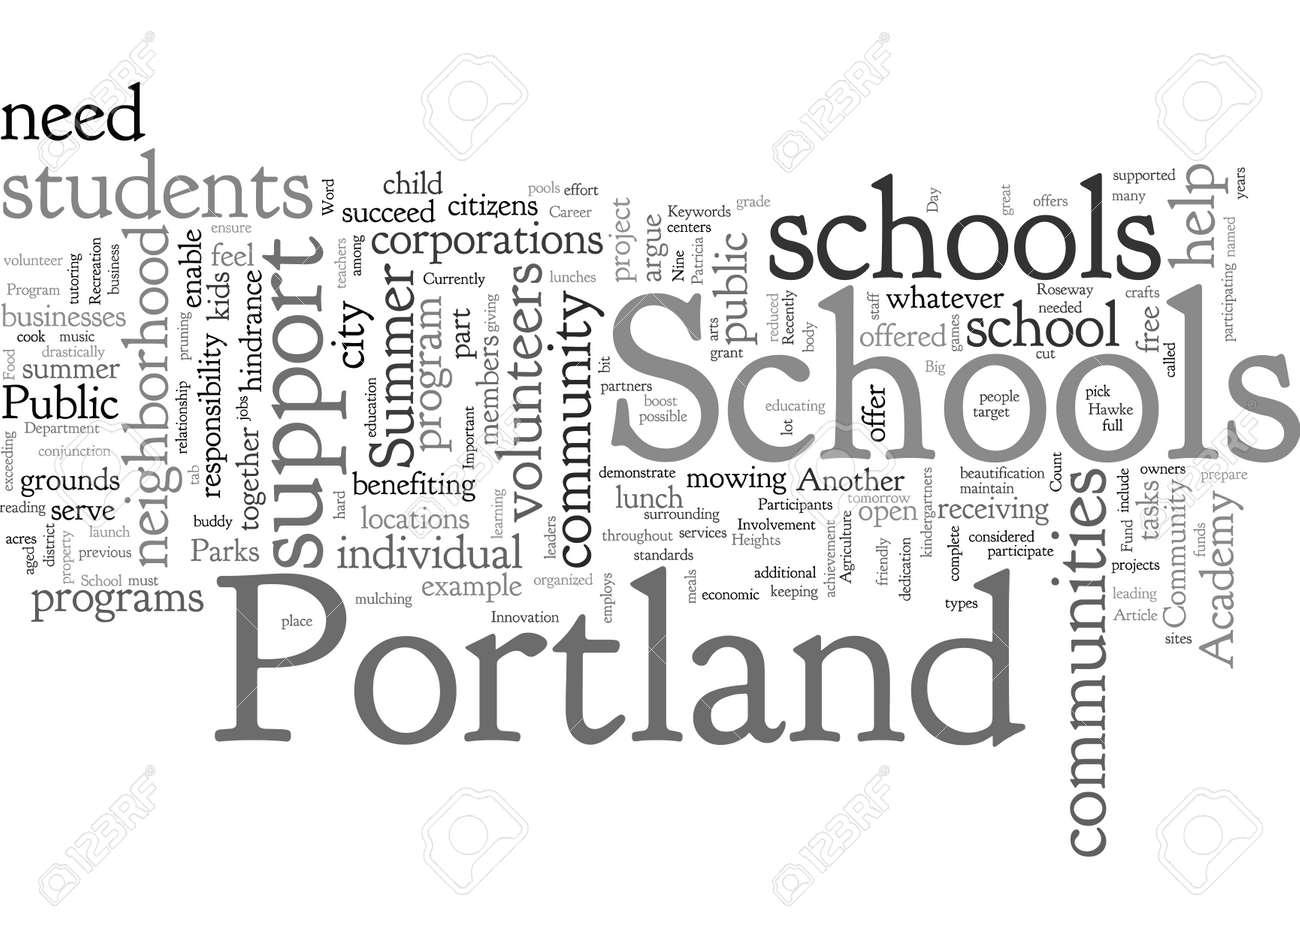 Community Involvement Important For Portland Schools - 132217880